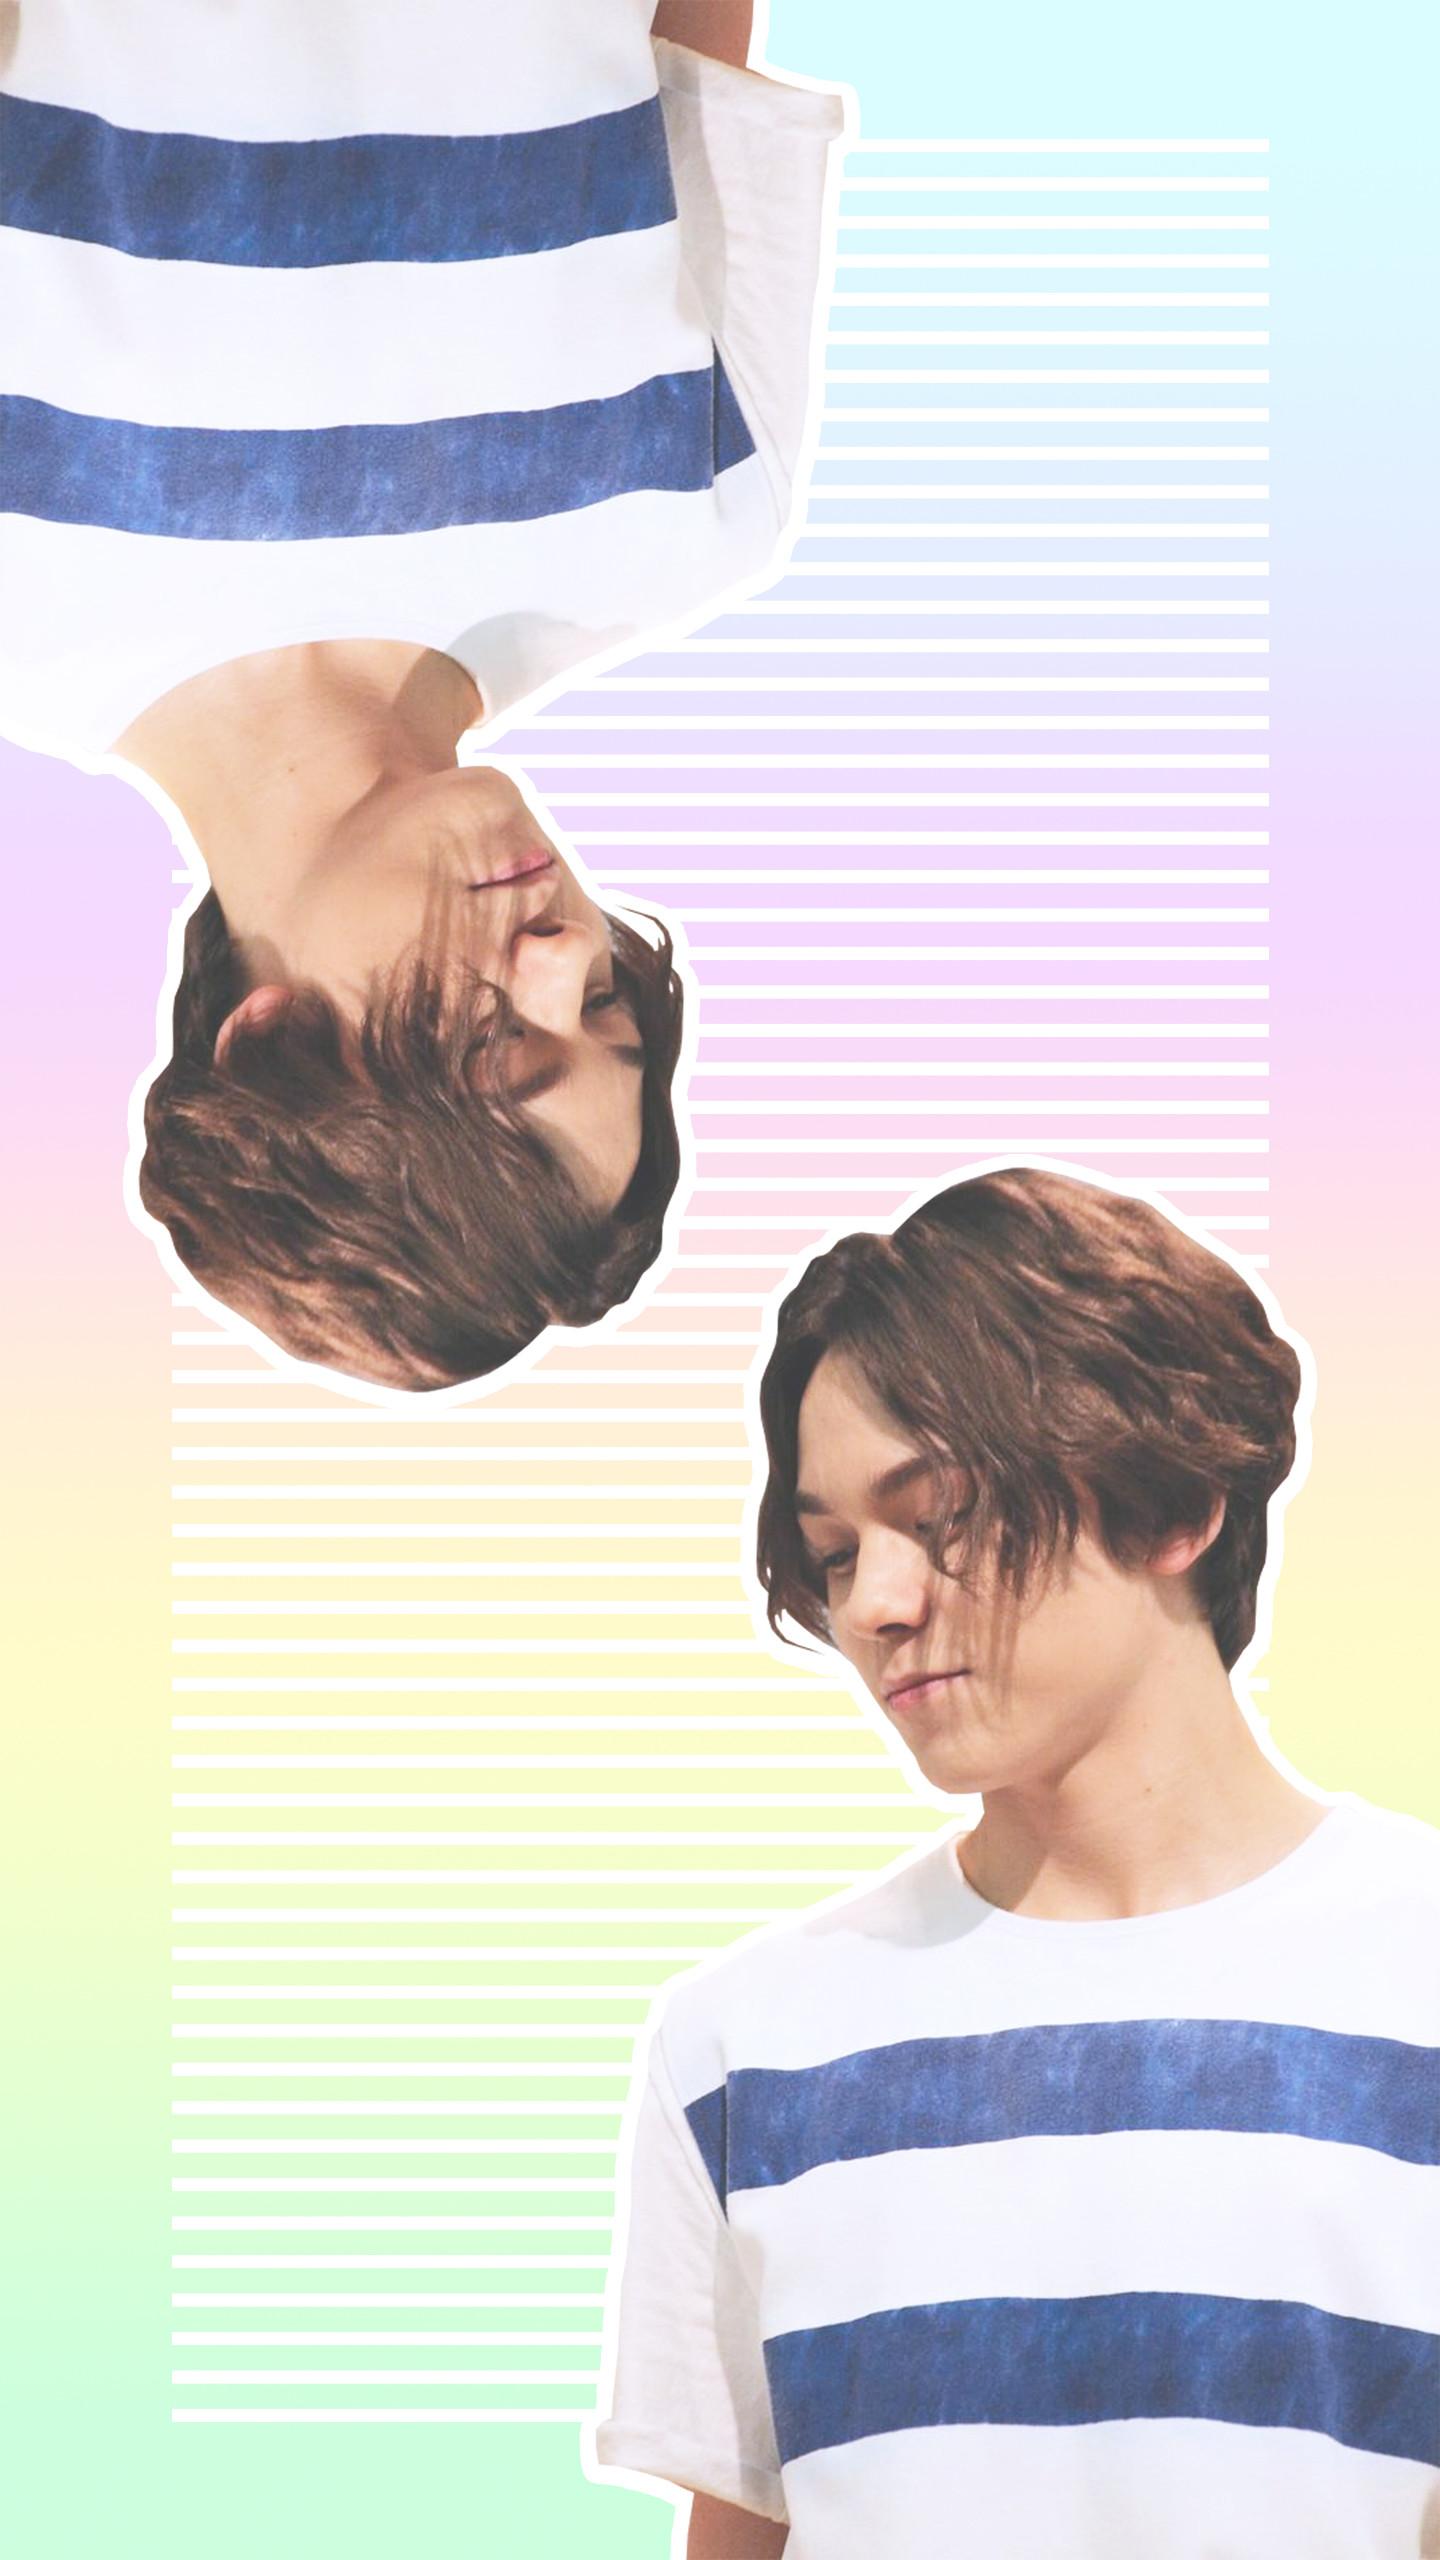 [SEVENTEEN-VERNON] Wallpaper. PhotoshopWallpapersKpop